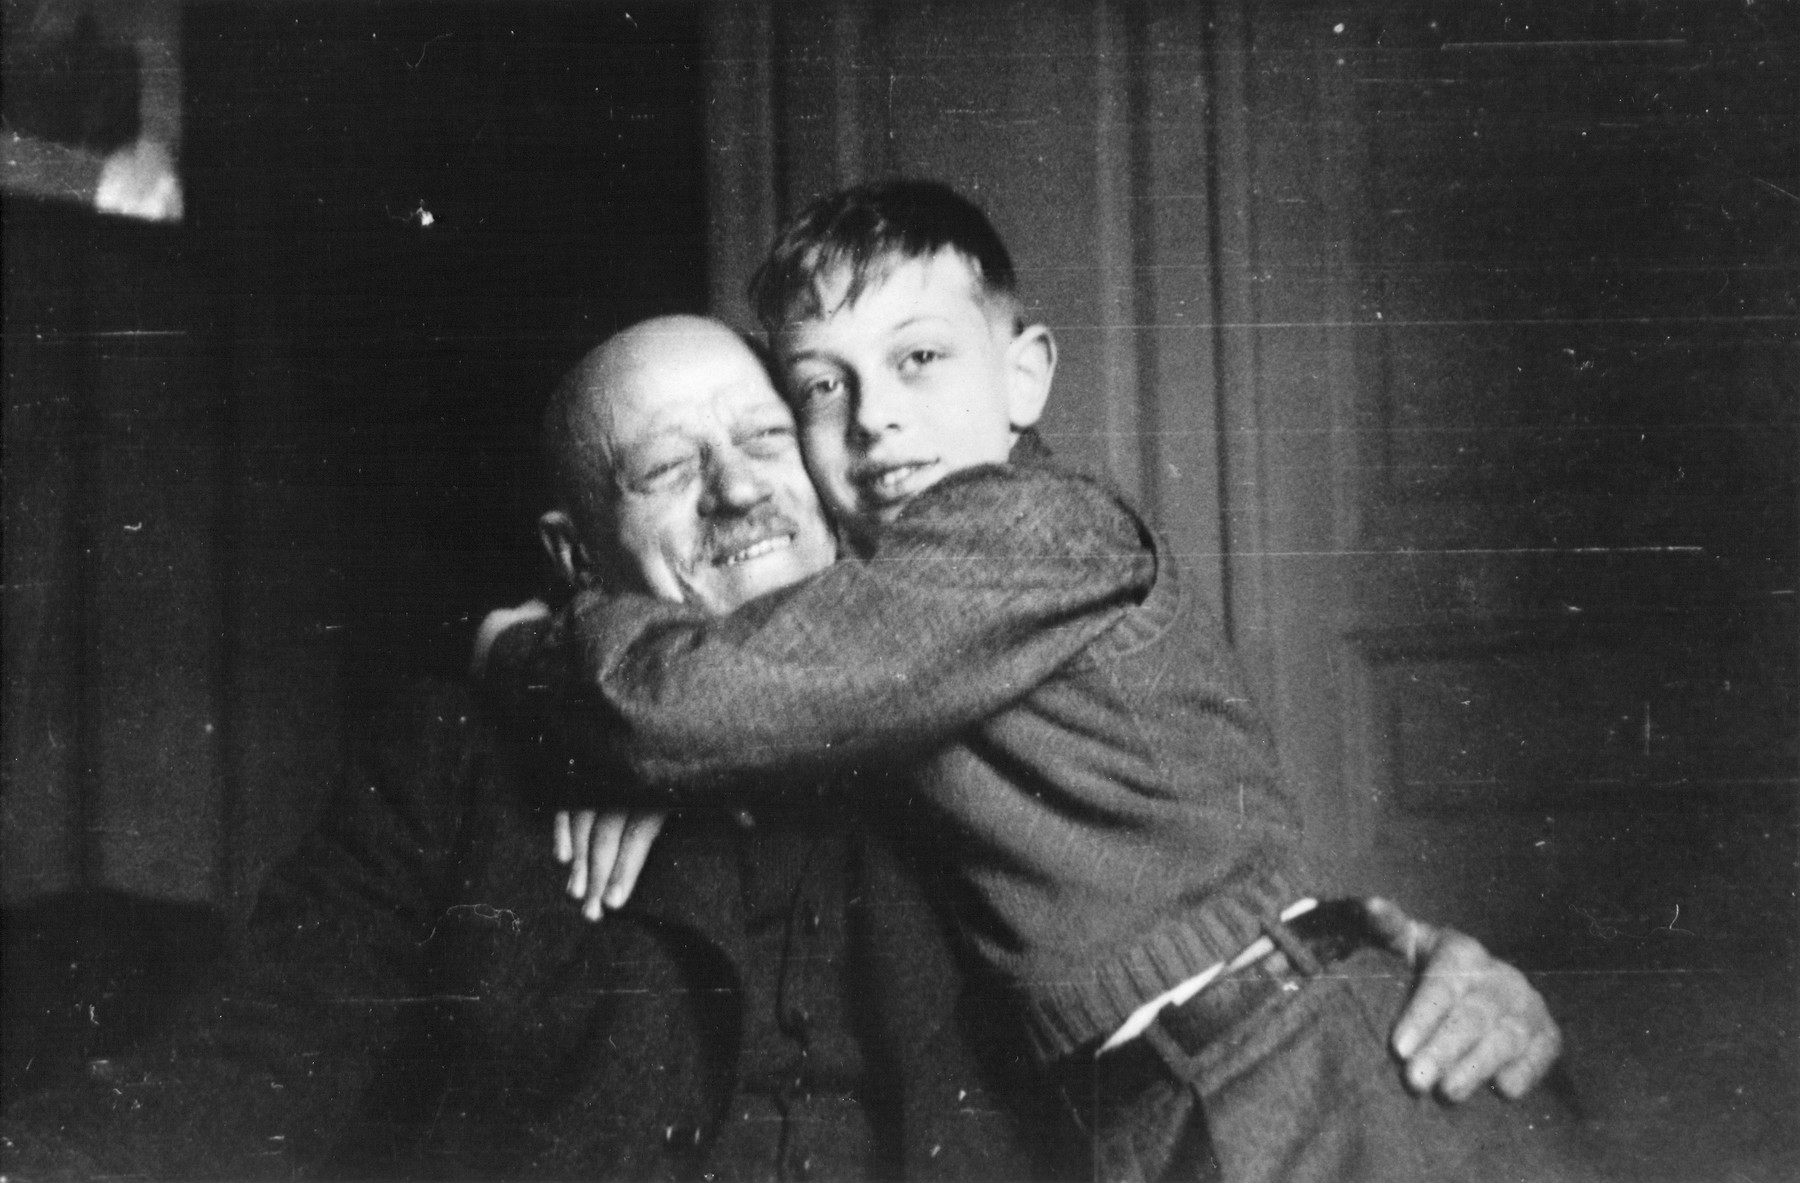 Olek gives his [grand]father a bear hug.